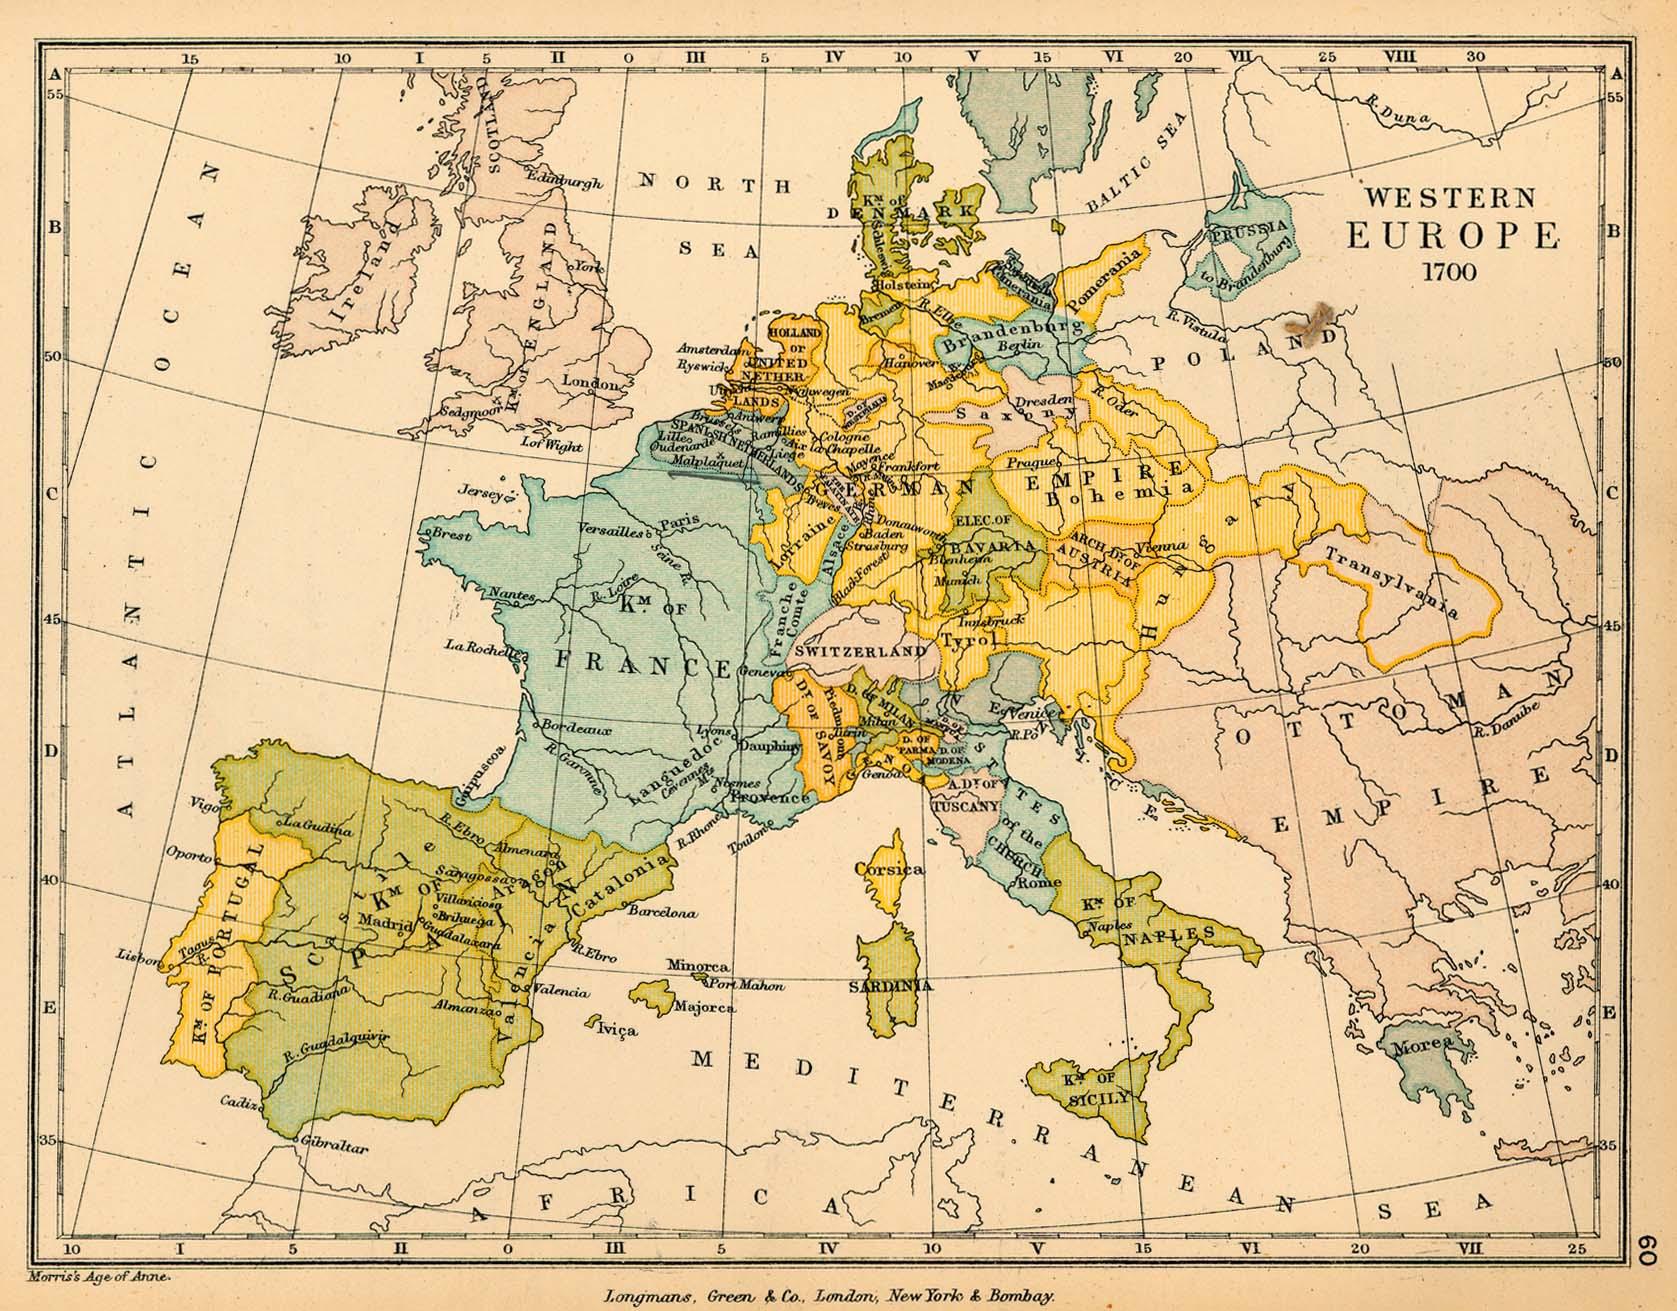 Western Europe in 1700